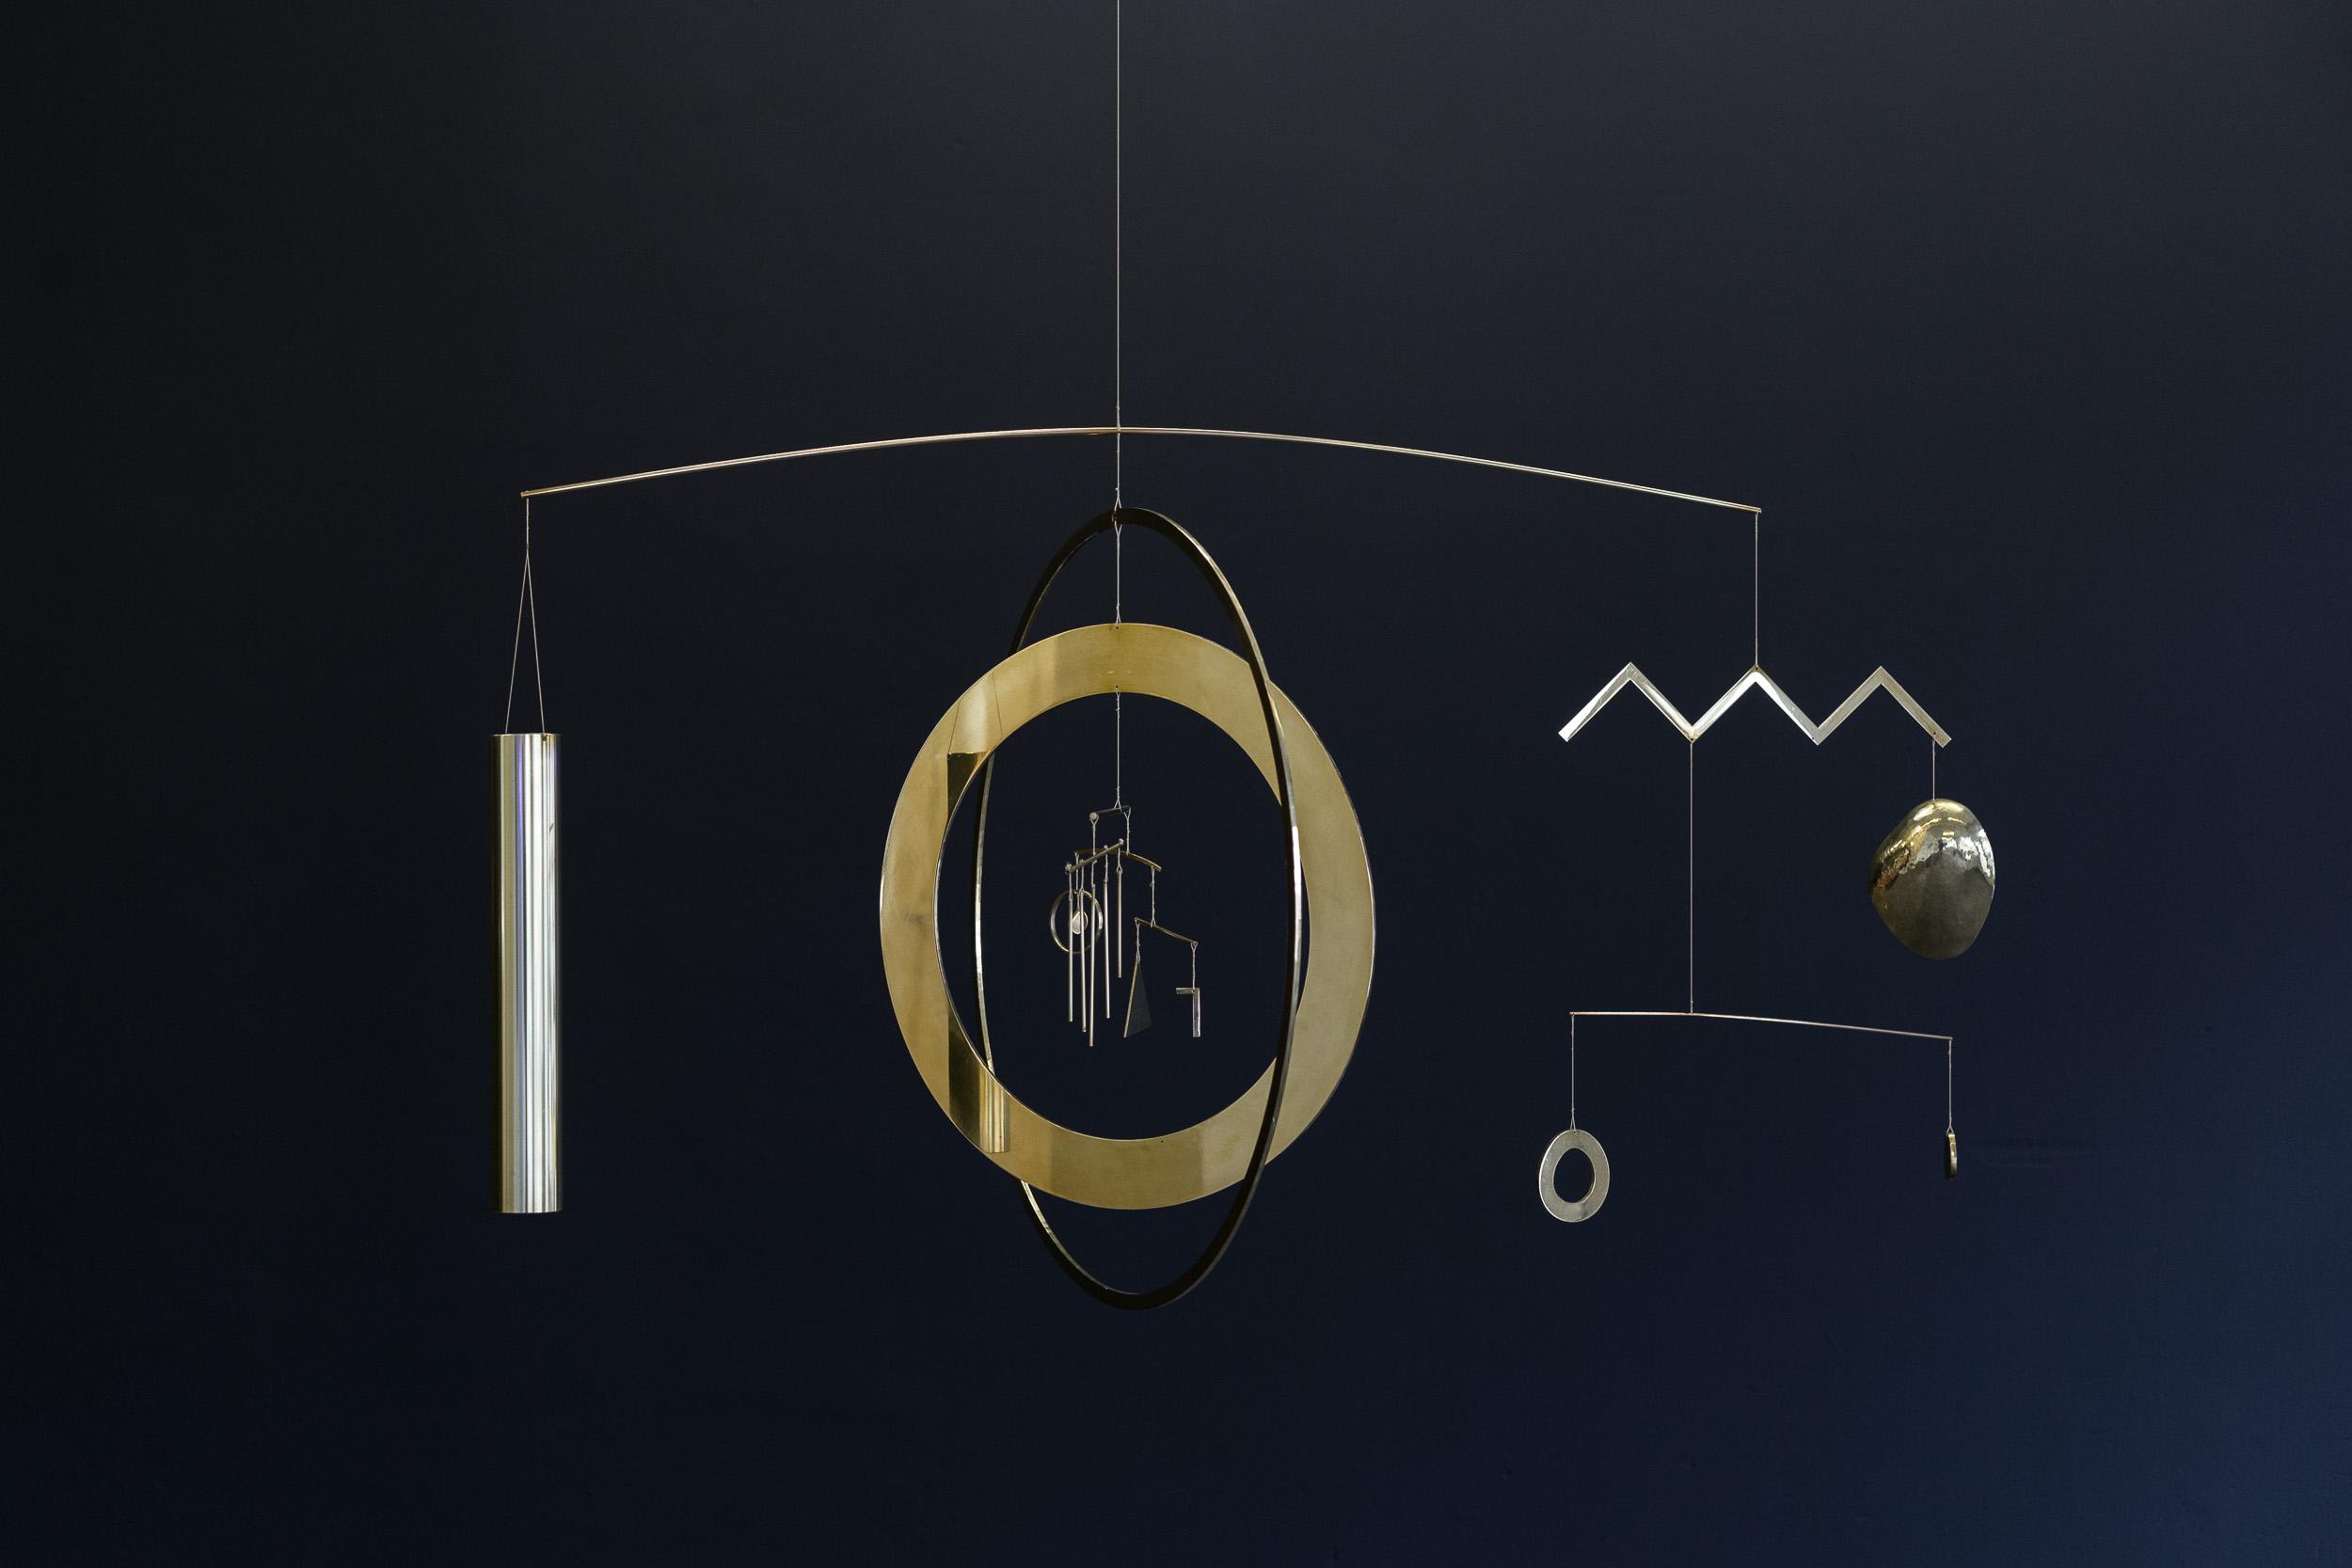 Kirstine Roepstorff,  Heart of the Whale , 2017,   Mobile: brass, steel  ,   90 x 157 x 18cm   Photo: Kilian Bannwart